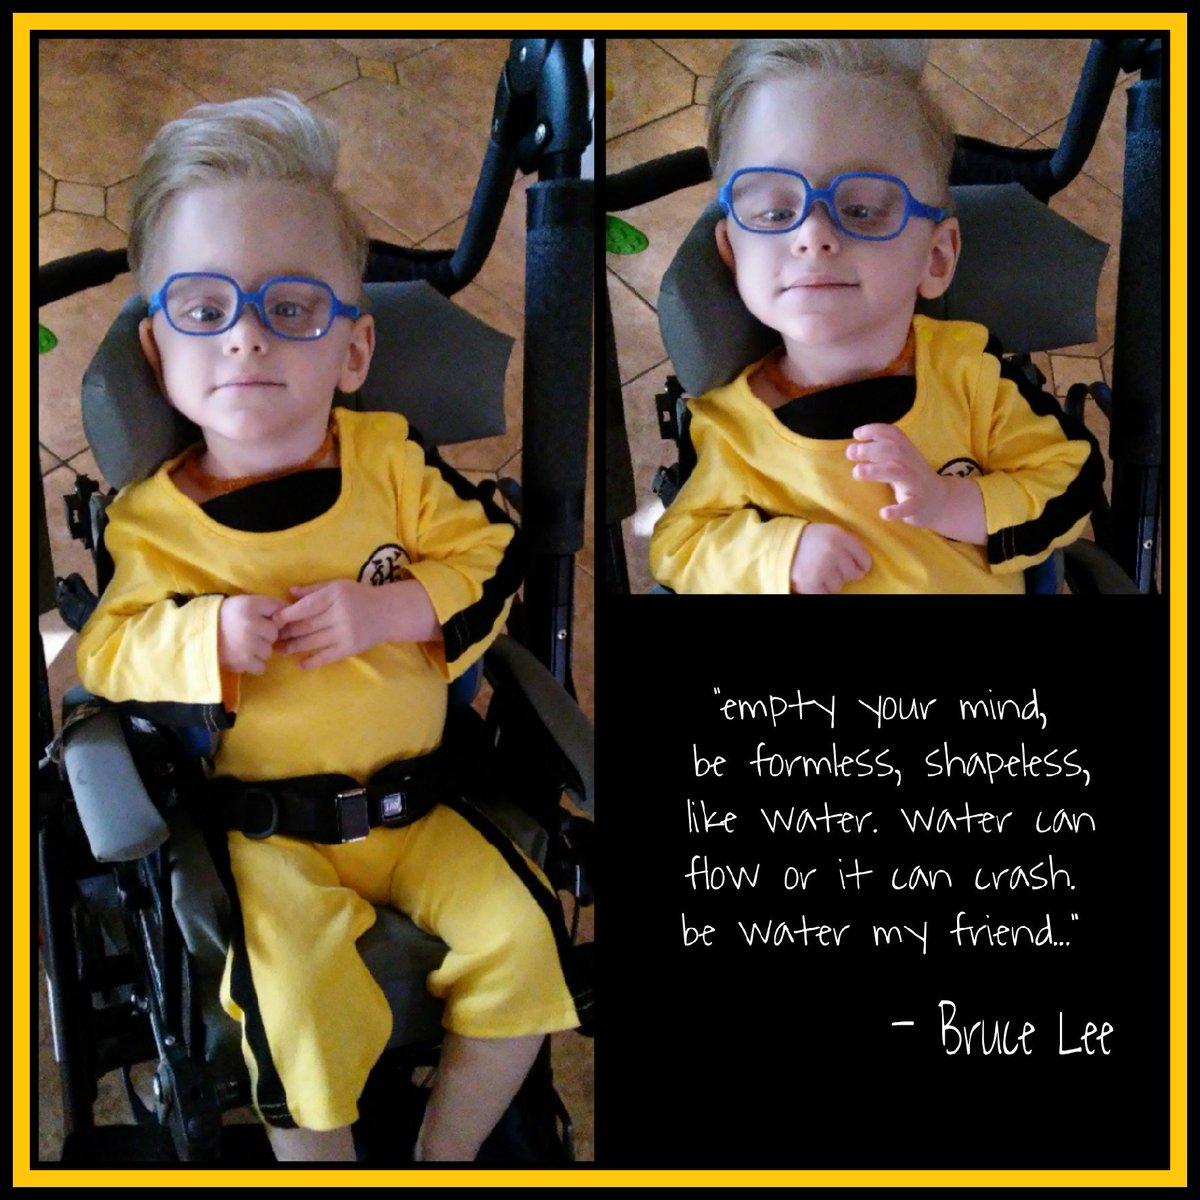 ca9905ebfc Bruce Lee Foundation ( BruceLeeFDN)